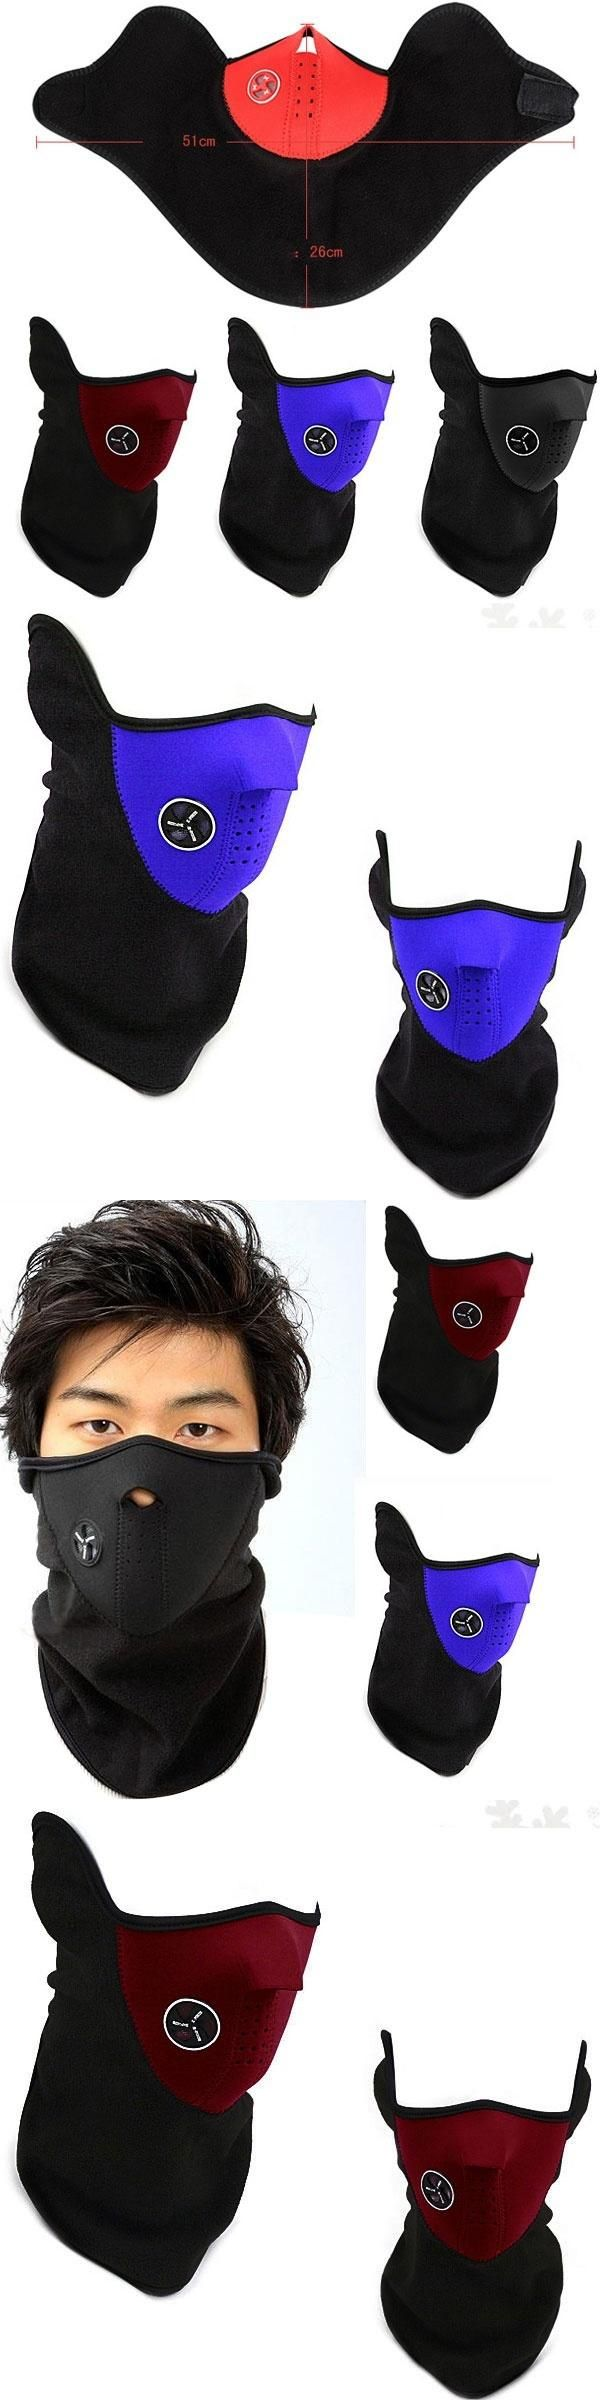 2017 Fashion Winter Unisex Winter Warm Half Face Mask Cover Neck Guard Scarf CS Sheld Ski Cycling Fashion Accessories